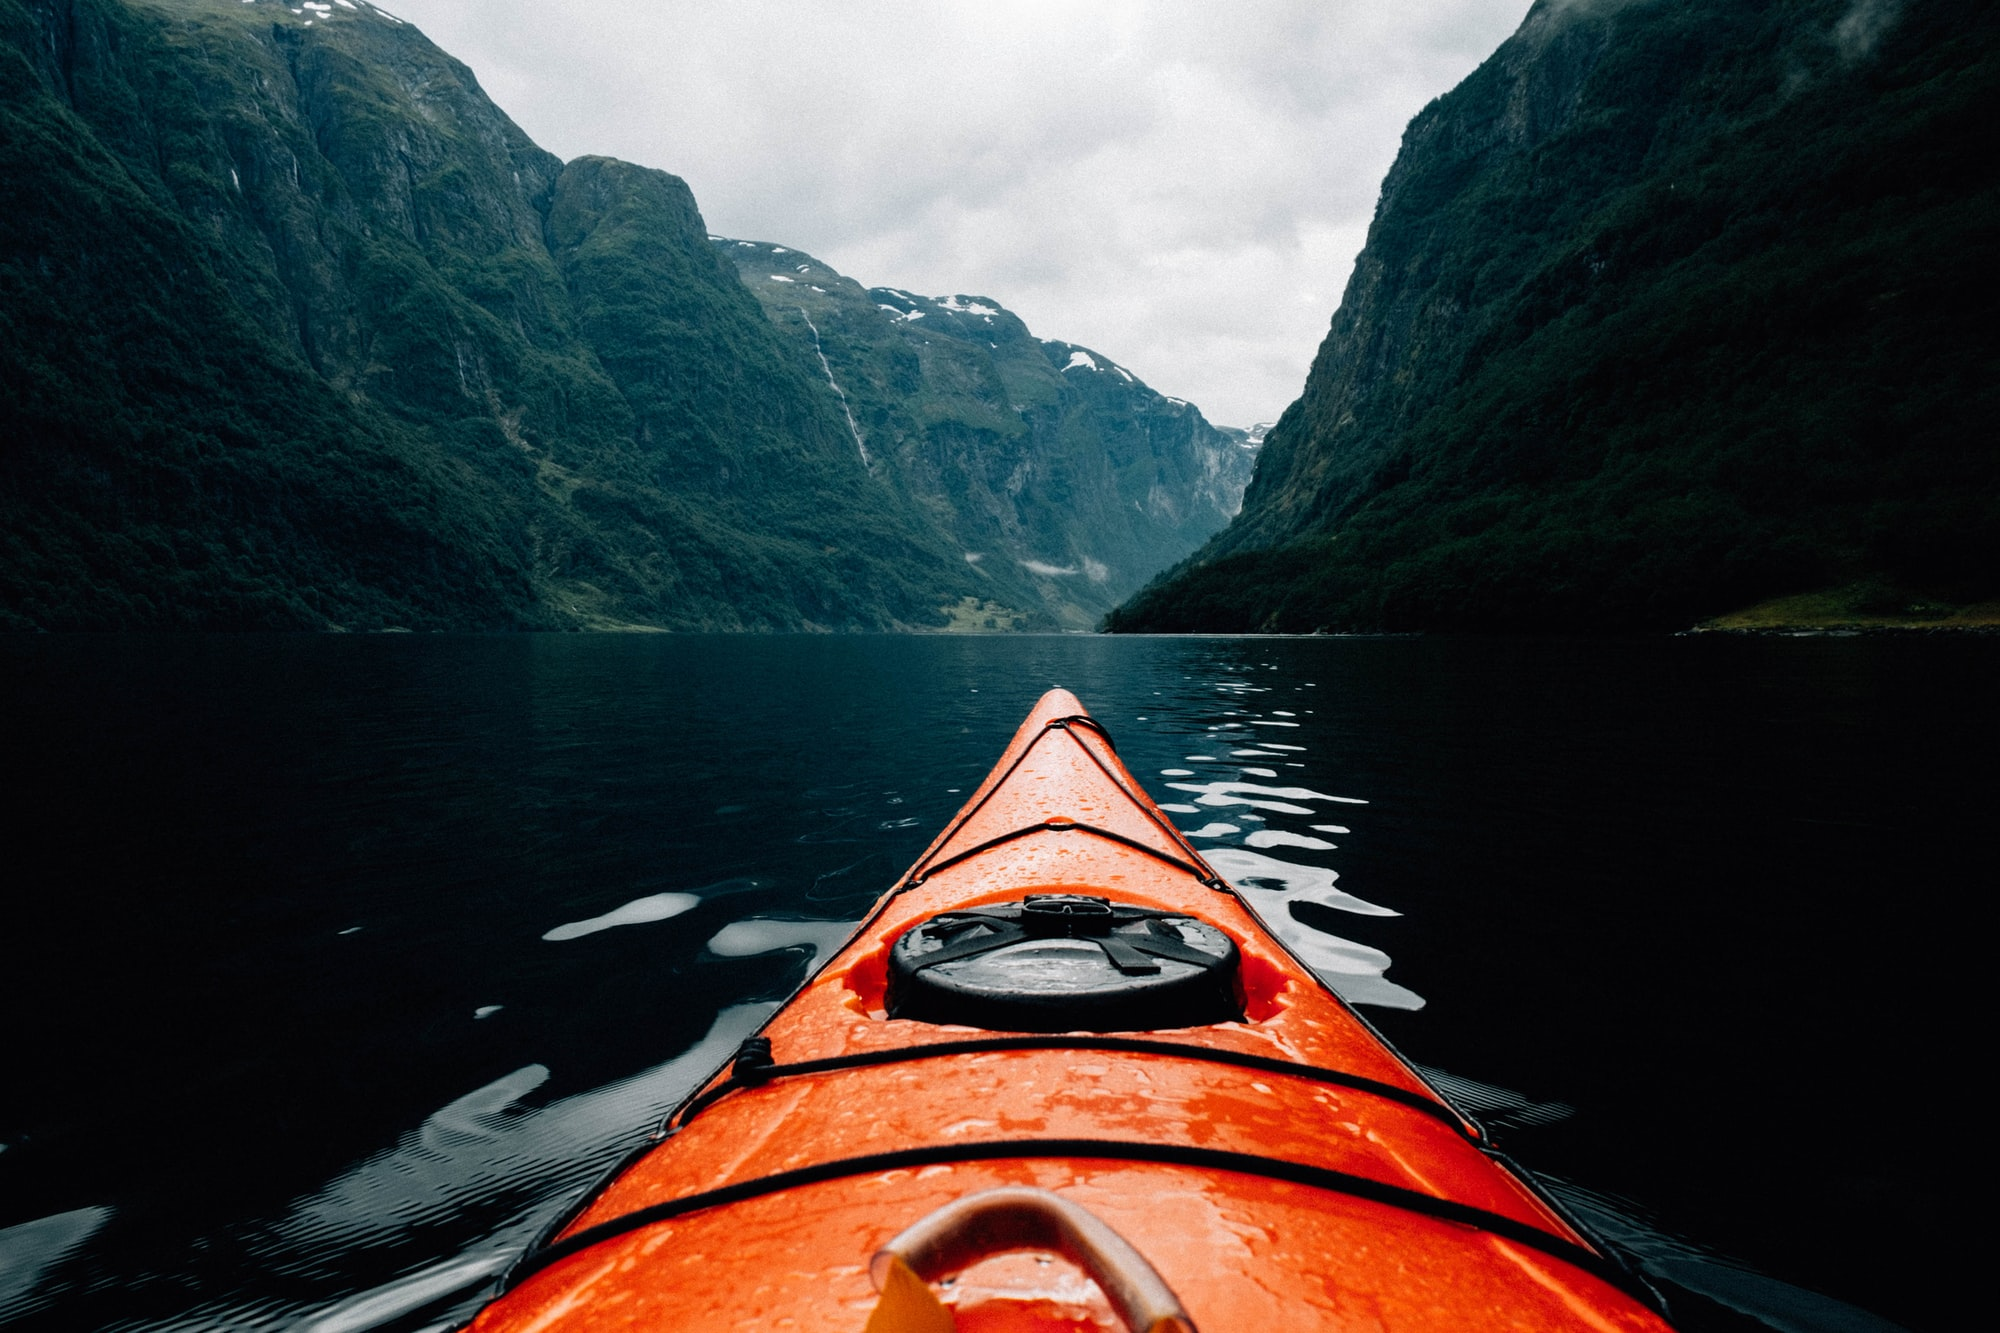 Getting Into Kayaking - Part 2